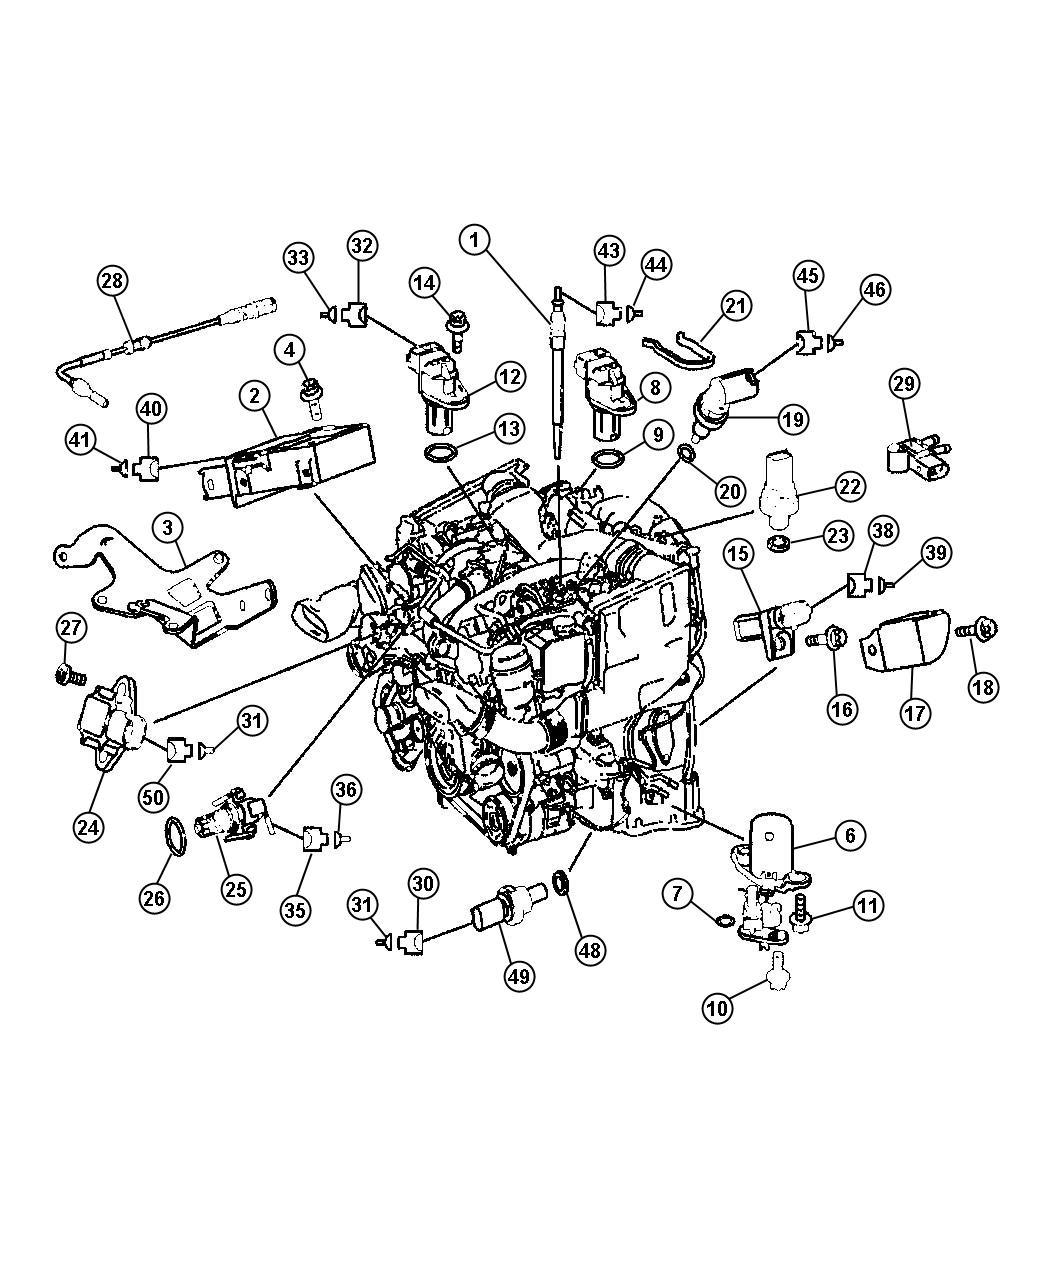 2008 Dodge Sprinter 2500 Module. Glow plug. Plugs, engine